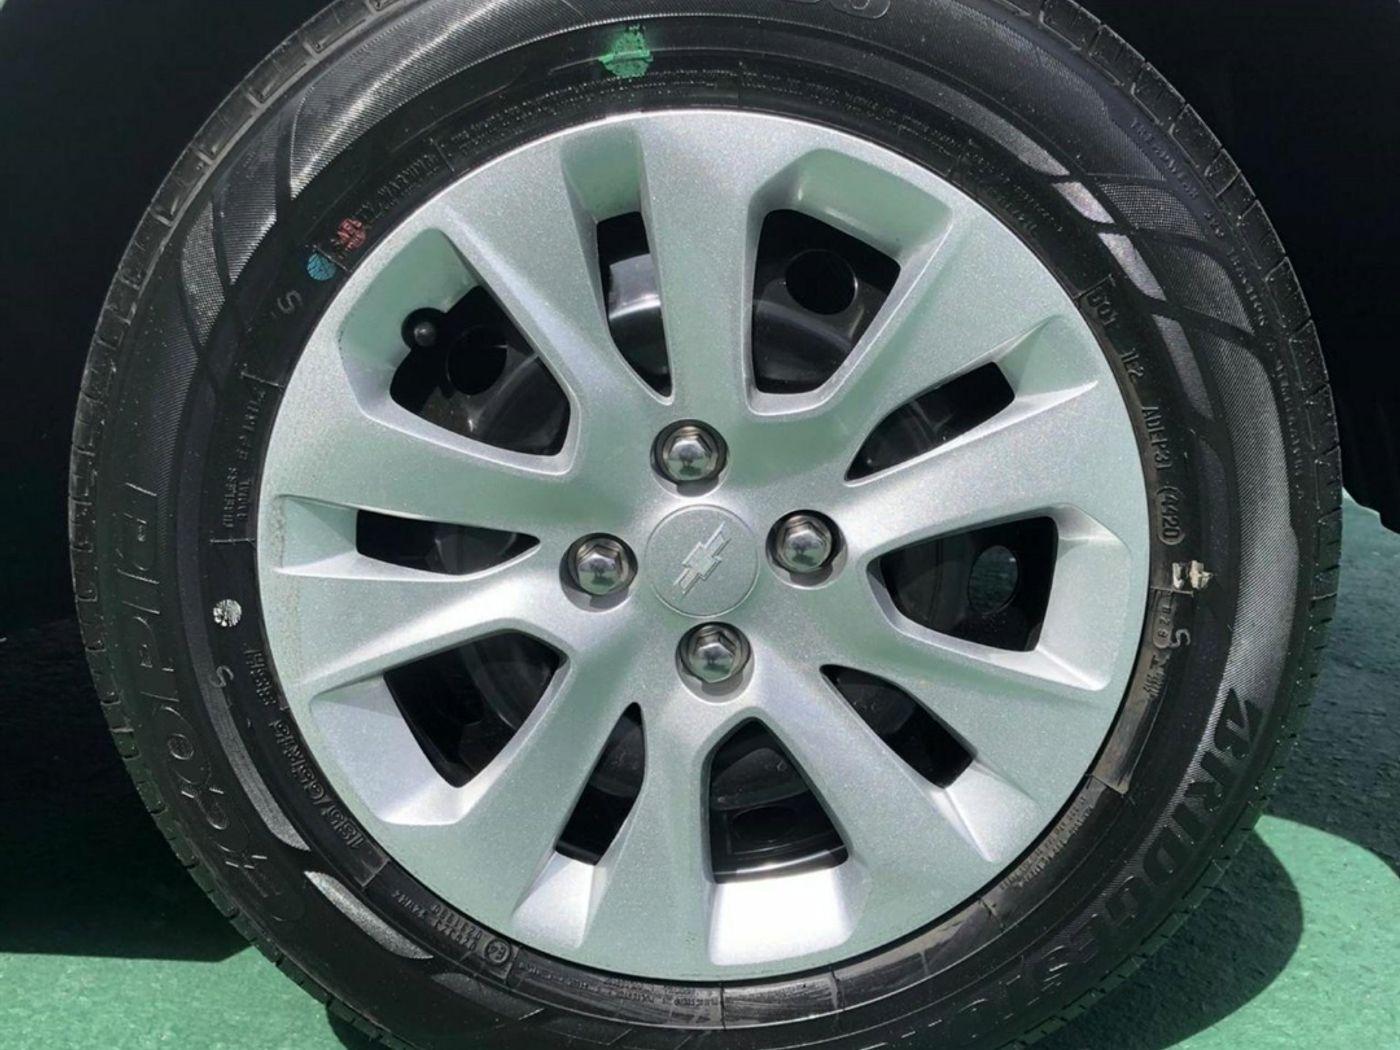 Chevrolet ONIX HATCH 1.0 12V TB Flex 5p Aut.